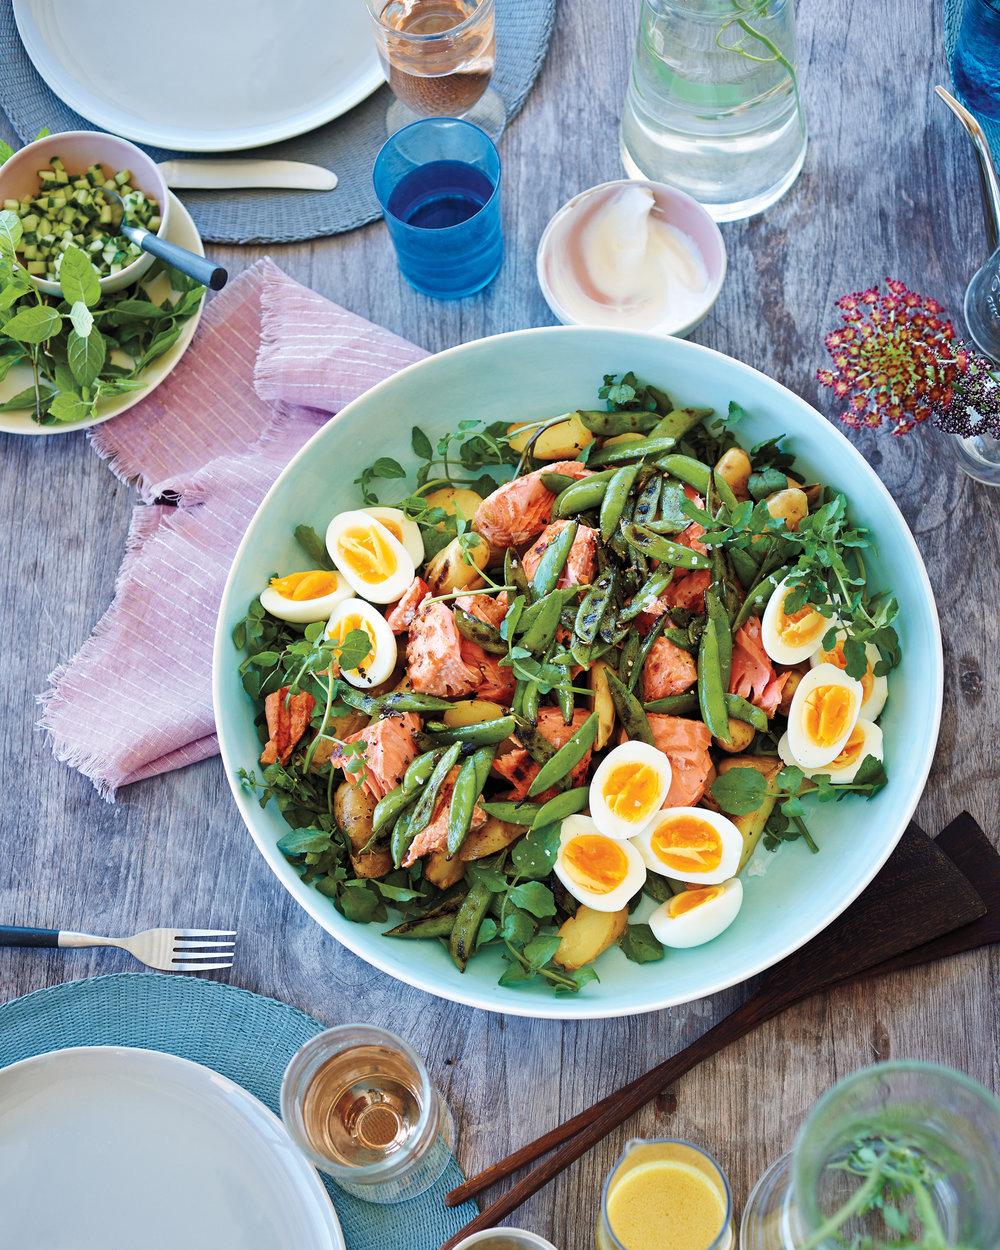 Mshelter-island-home-salad-eggs-salmon-peas-10-005-d111623.jpg